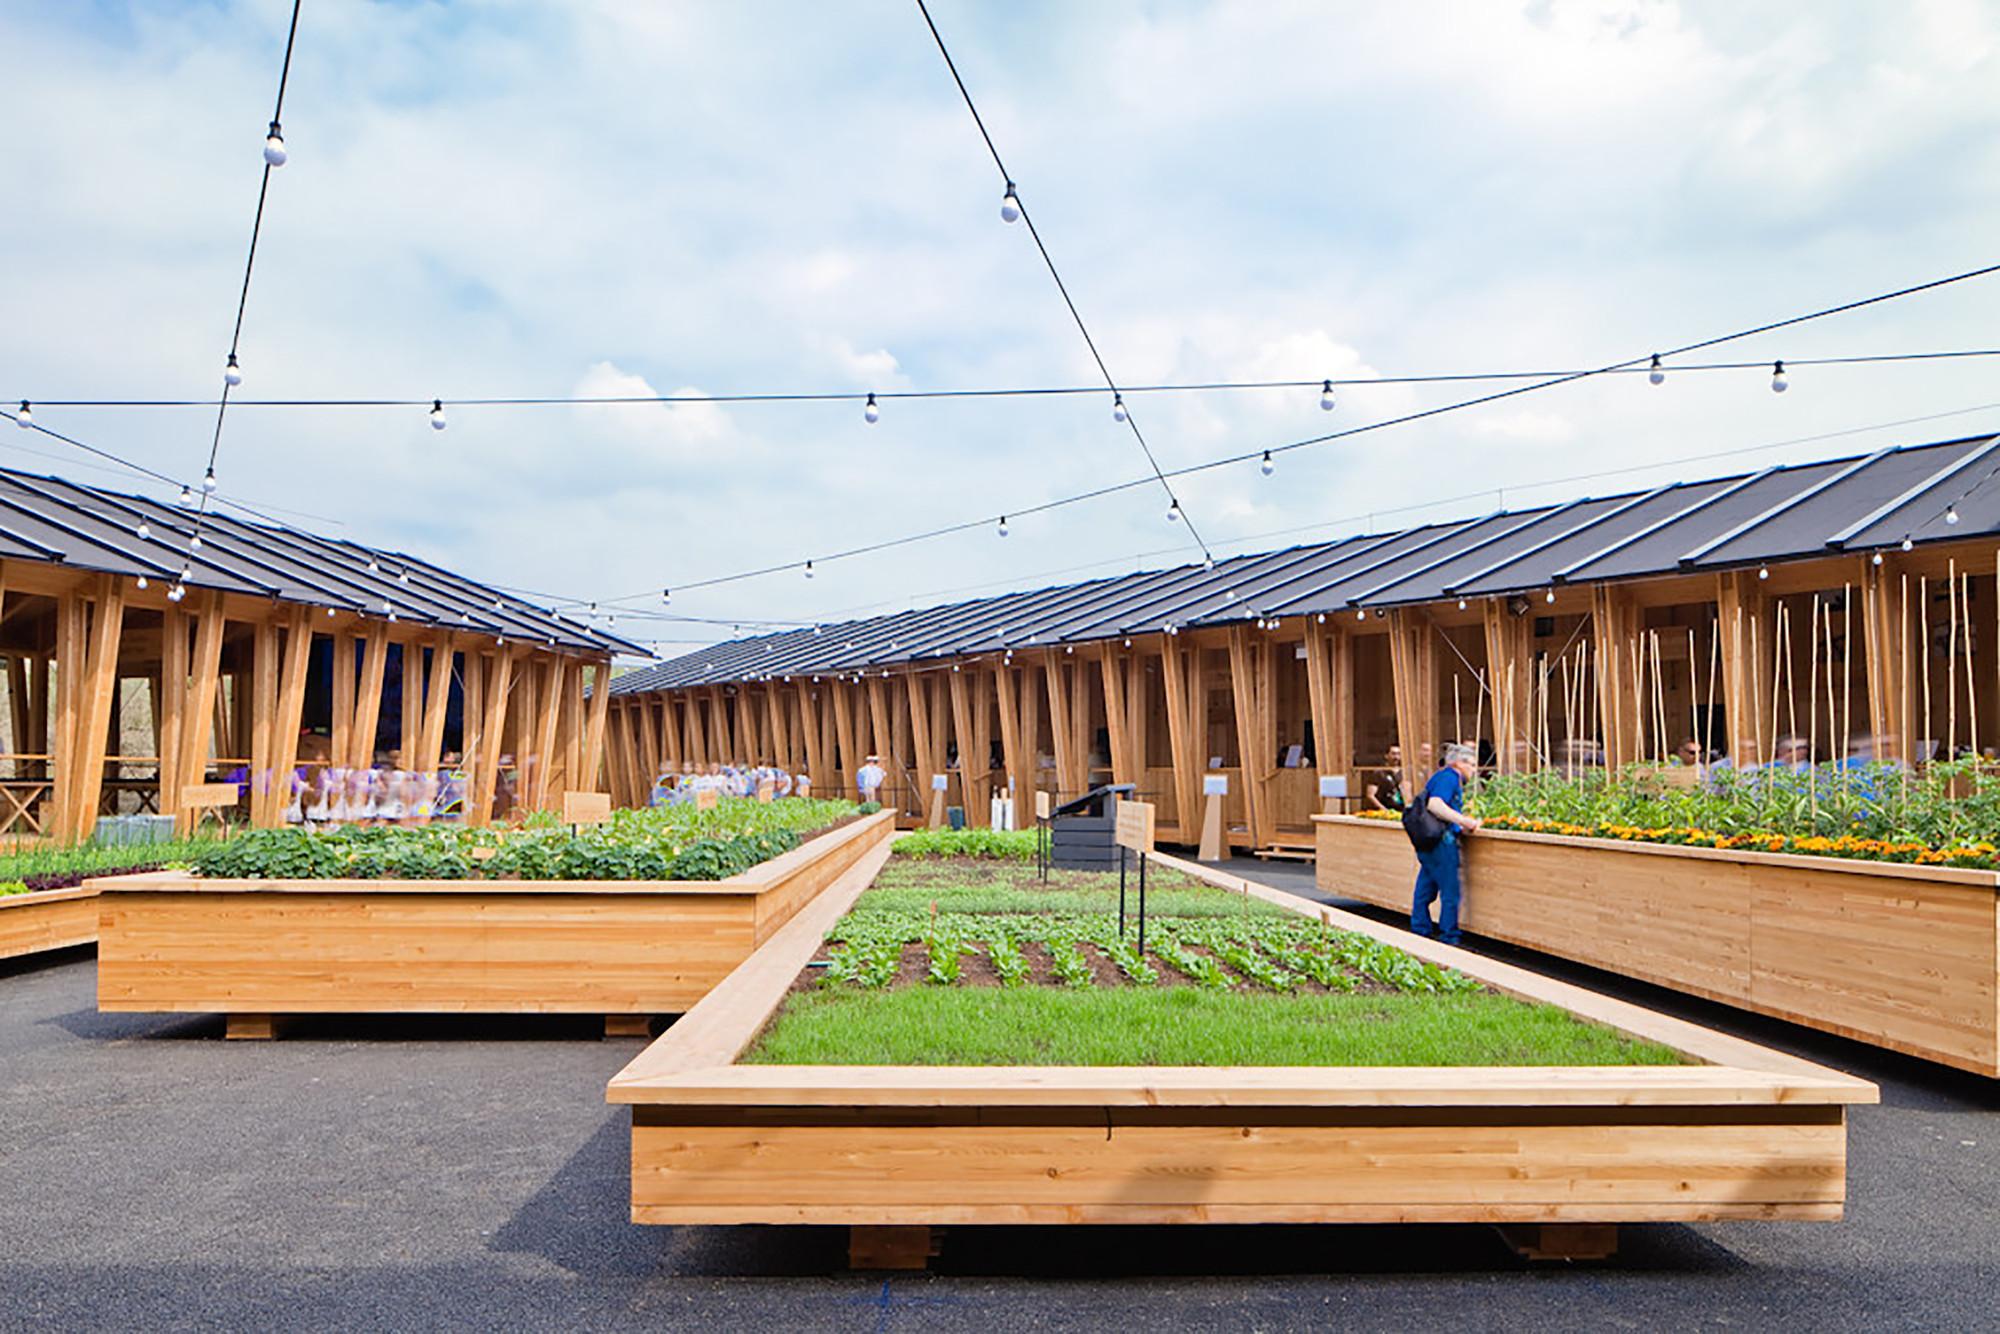 Slow Food Pavilion - Milan Expo 2015 / Herzog & de Meuron, © Marco Jetti